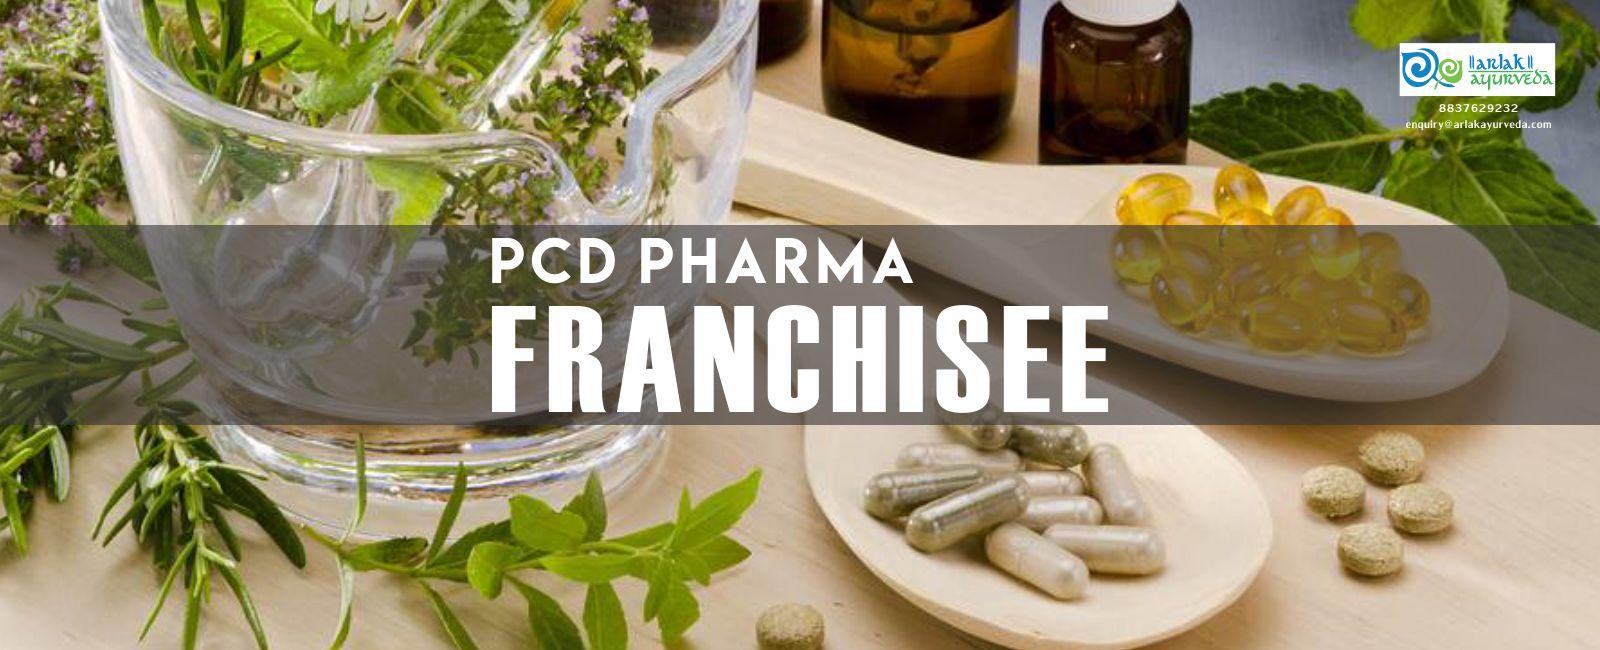 PharmaBizConnect Offers New Age Pharma Marketing Solutions to Neutraceutical Pharma Companies